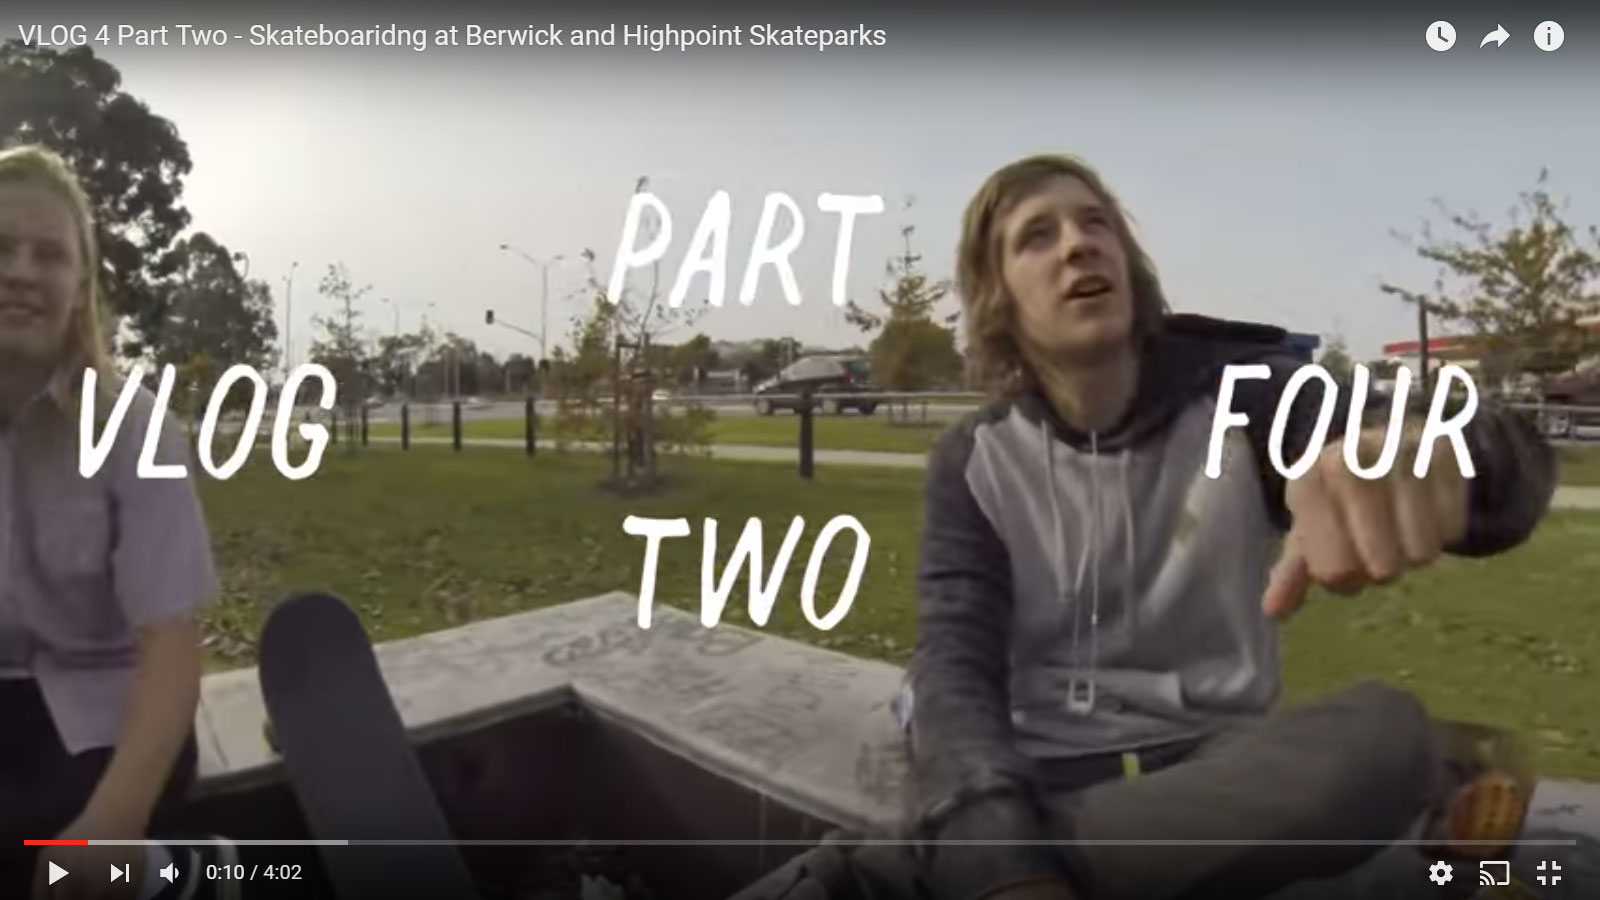 Dylan Warren Vlog 4 – Part 2 Skateboarding at Berwick and Highpoint Skateparks